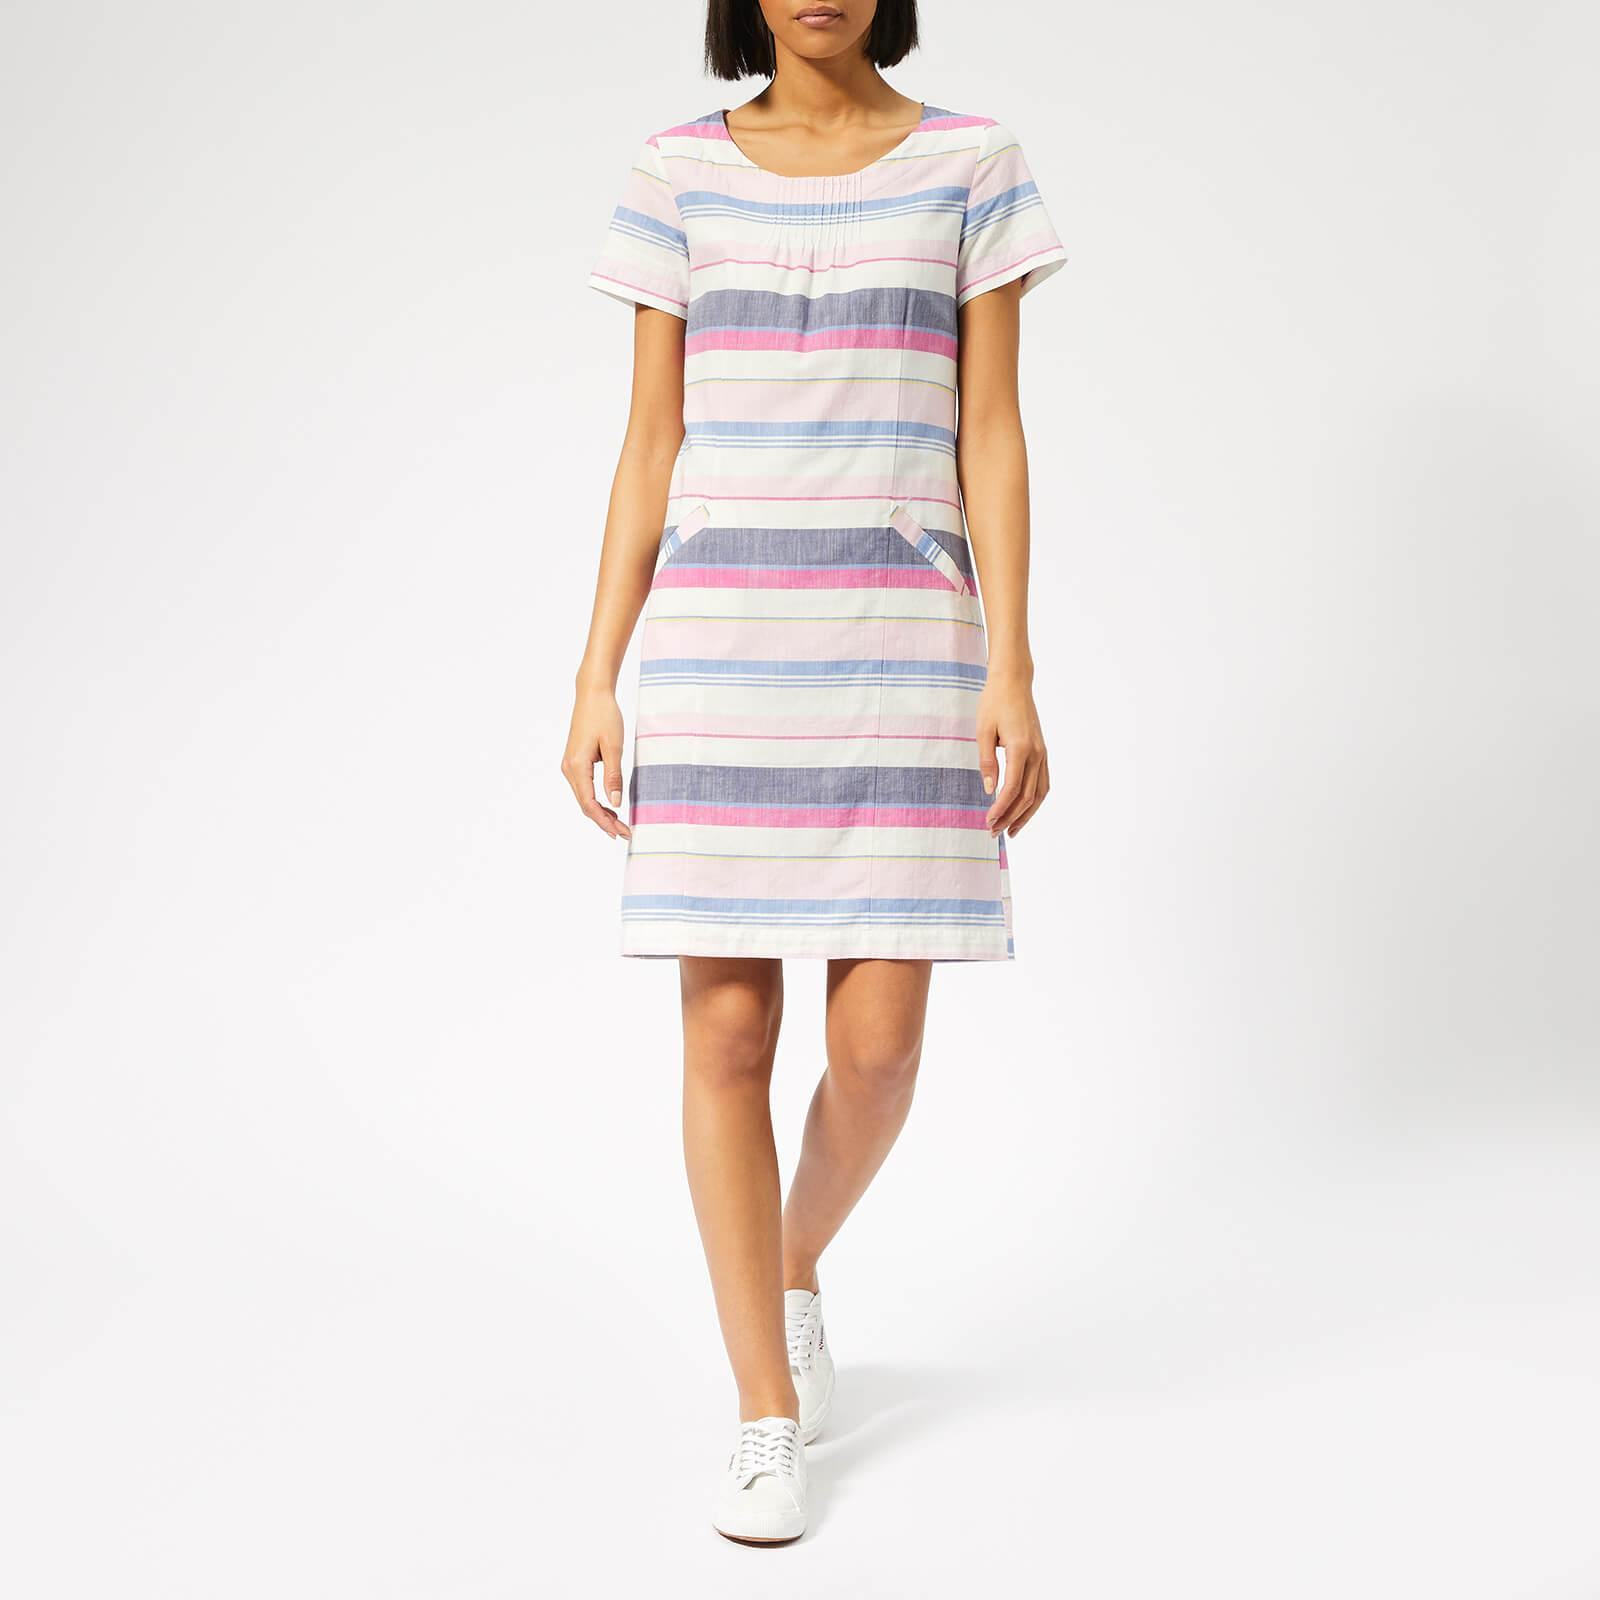 2042e0e56f ... Henrietta Linen Shift Dress - Lyst. View fullscreen